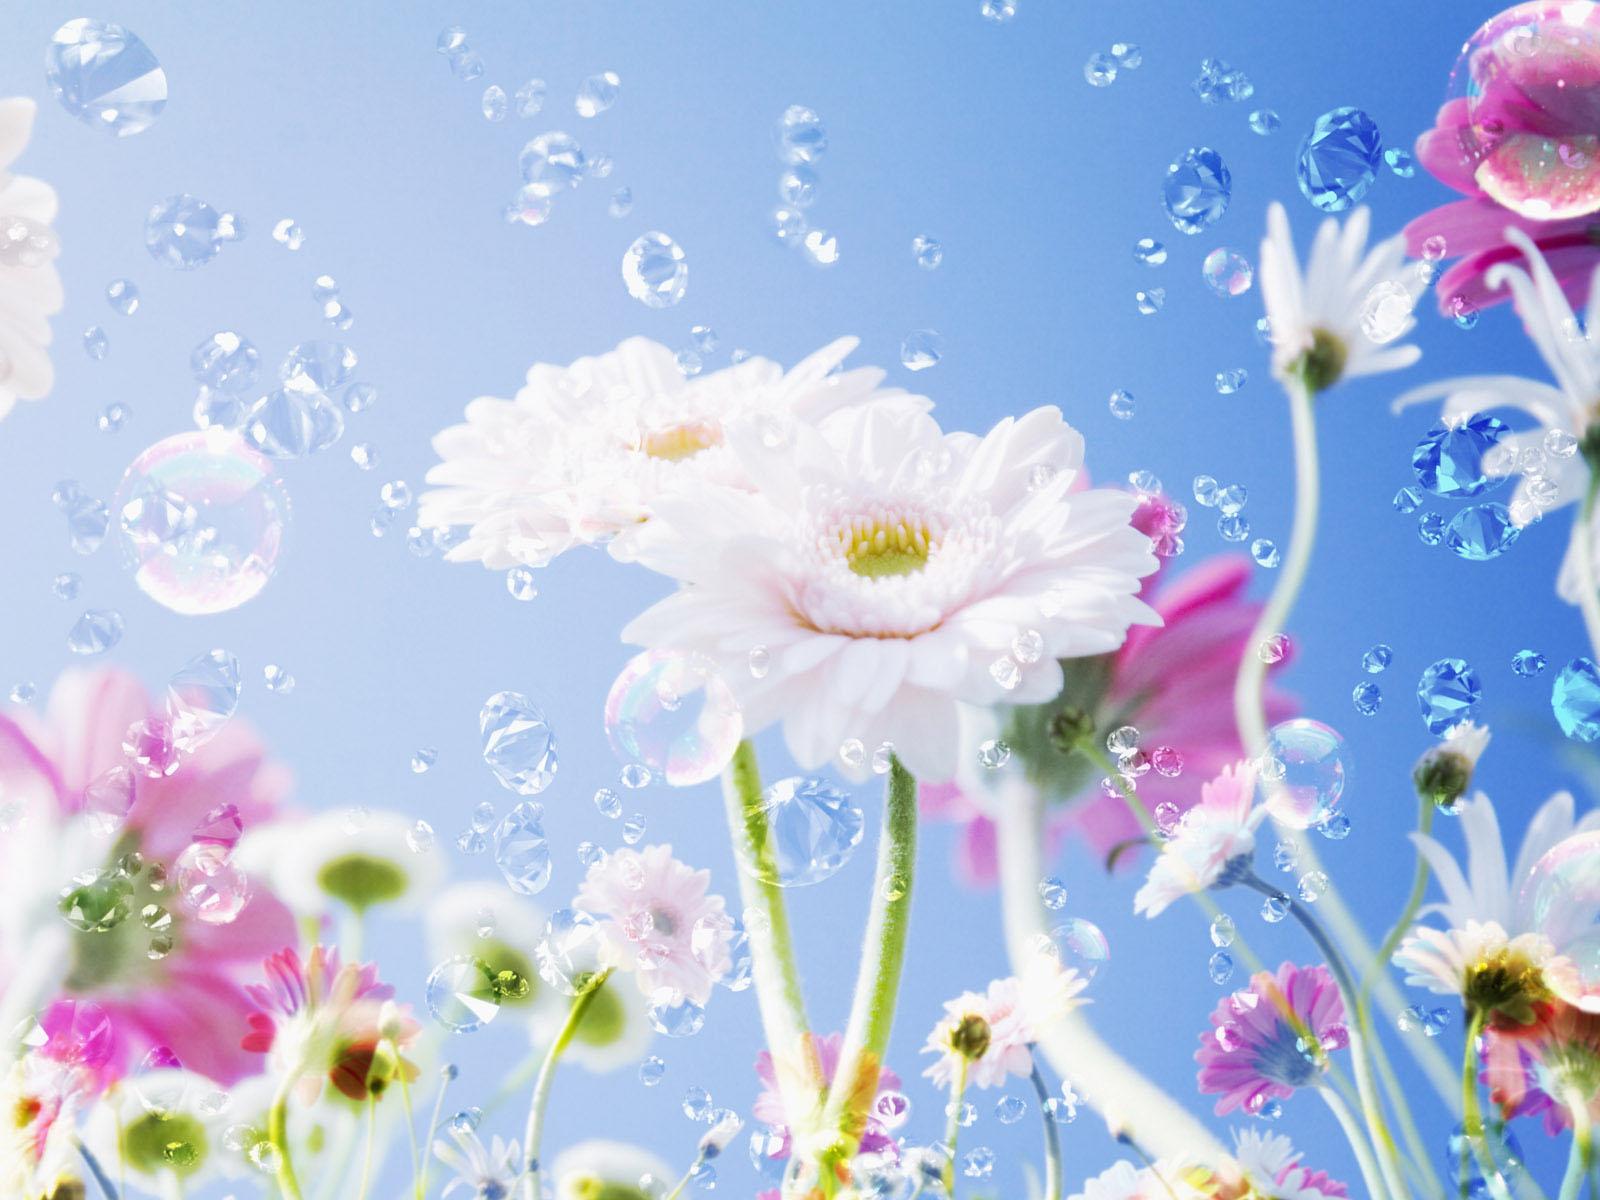 wallpapers Flowers Wallpapers for Desktop 1600x1200